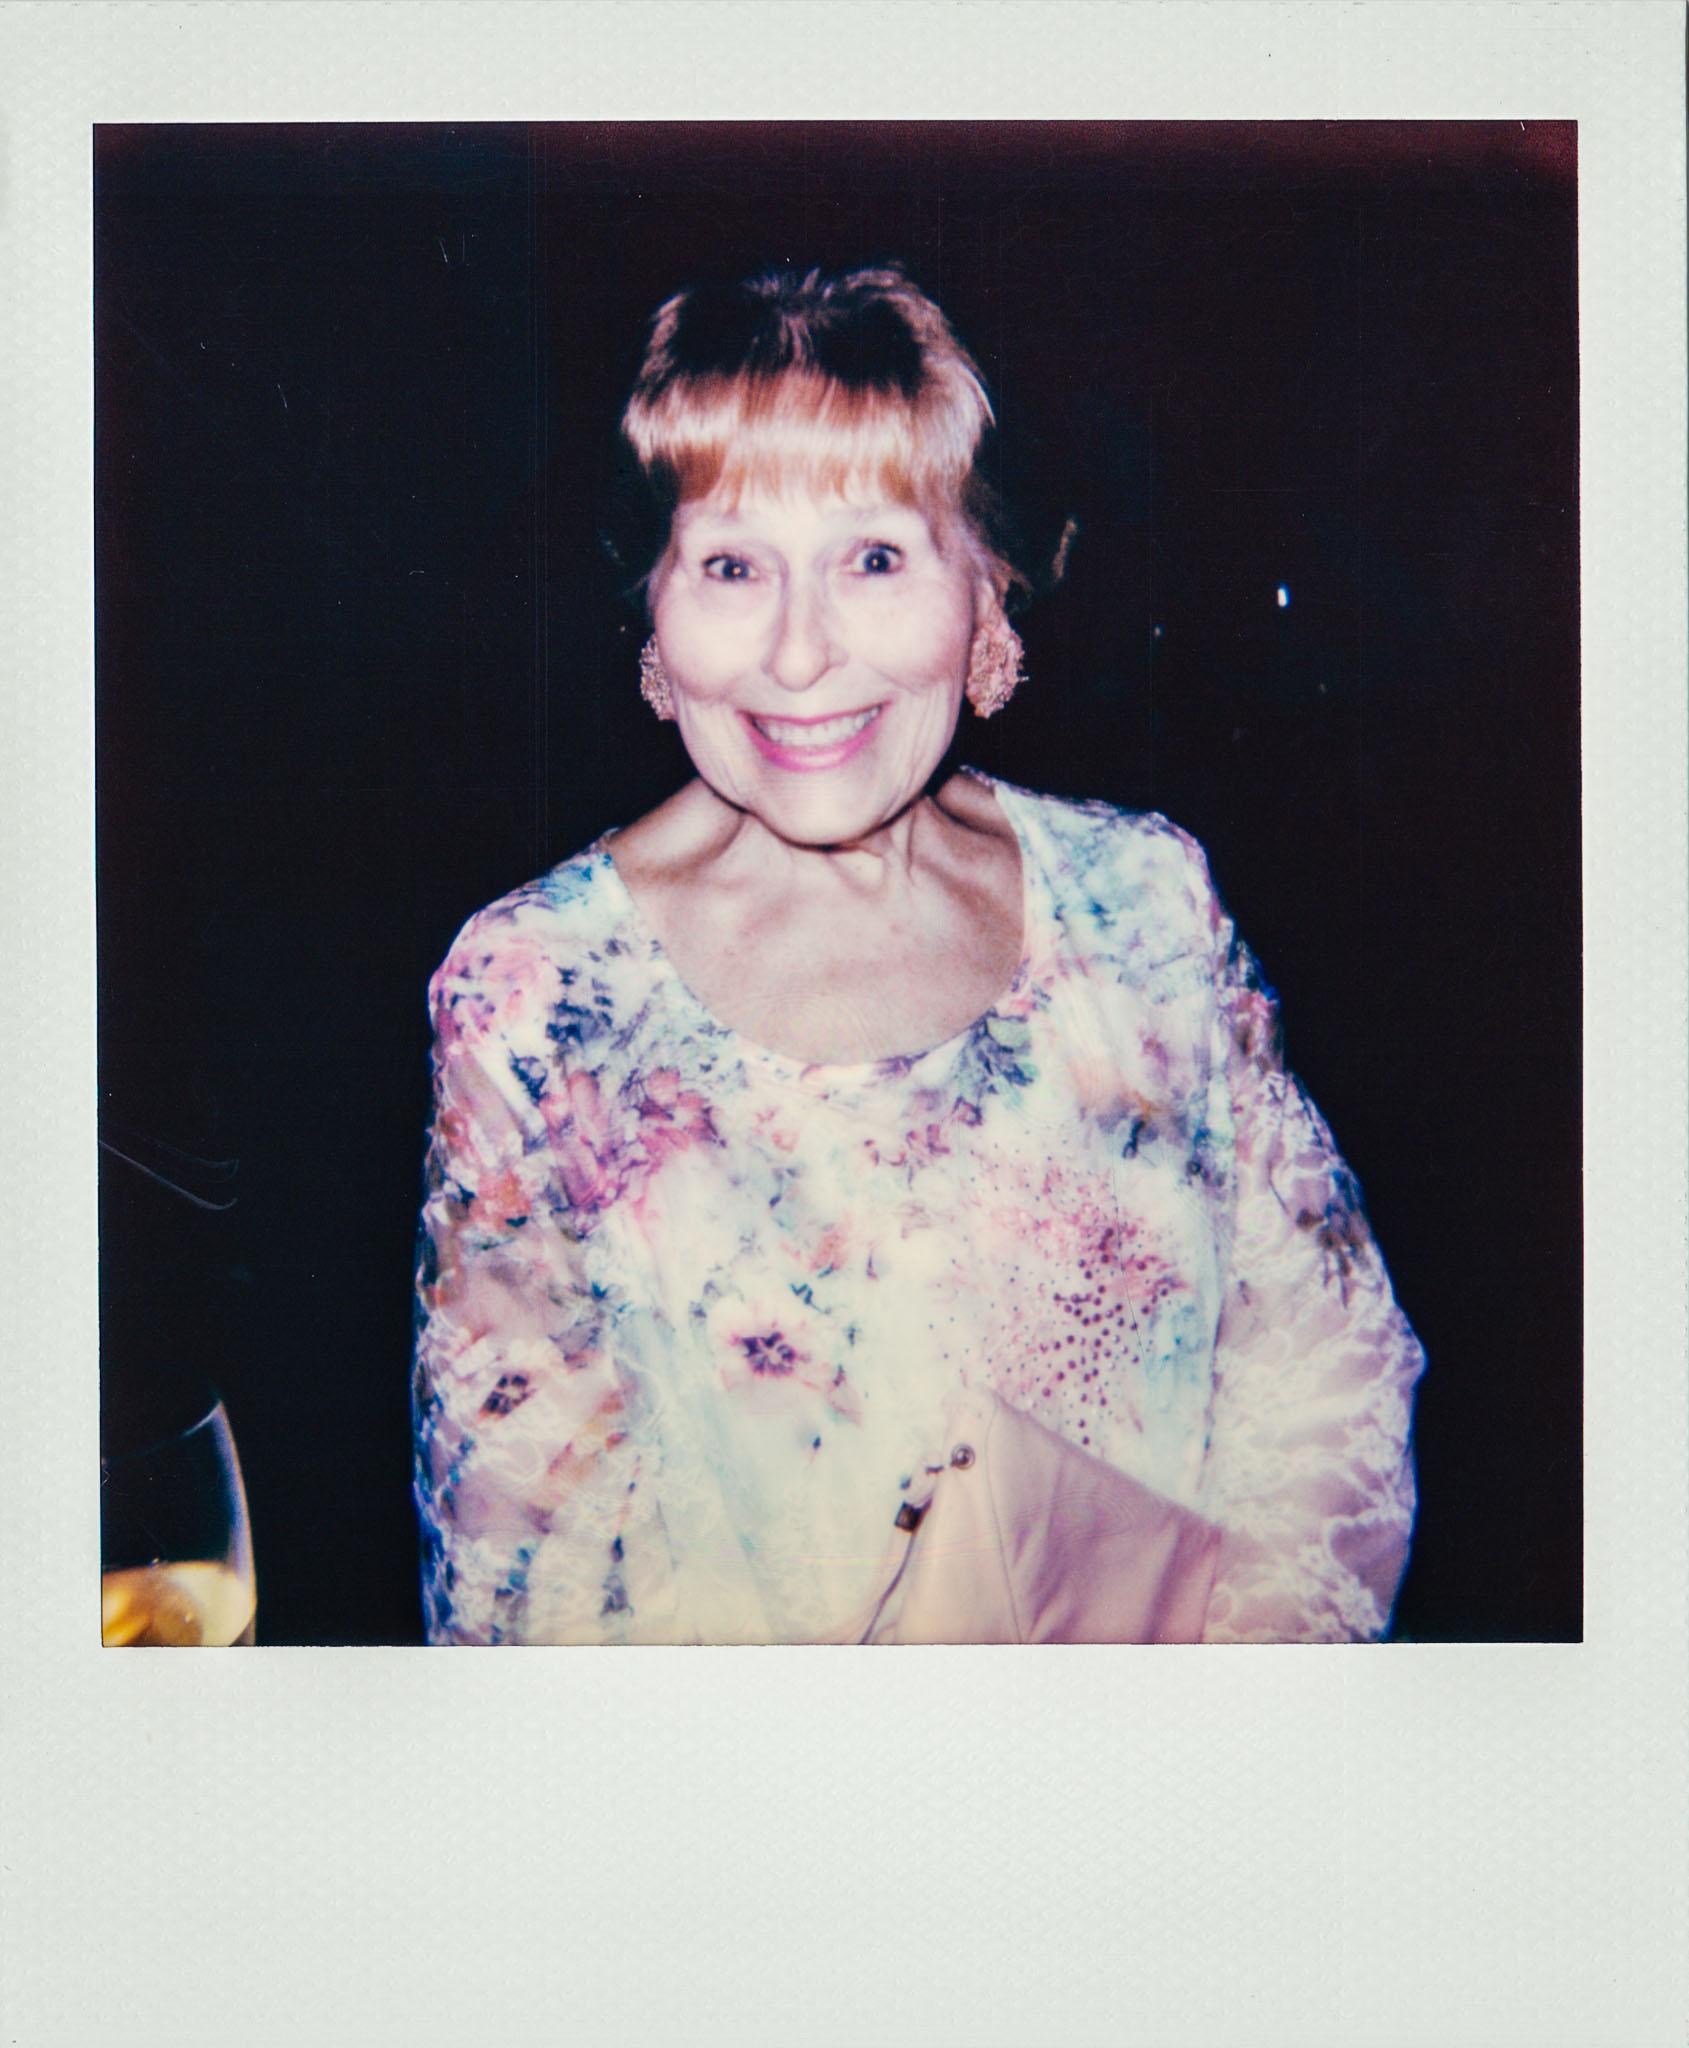 Linda-Updike-Wallys-Polaroid-2.jpg